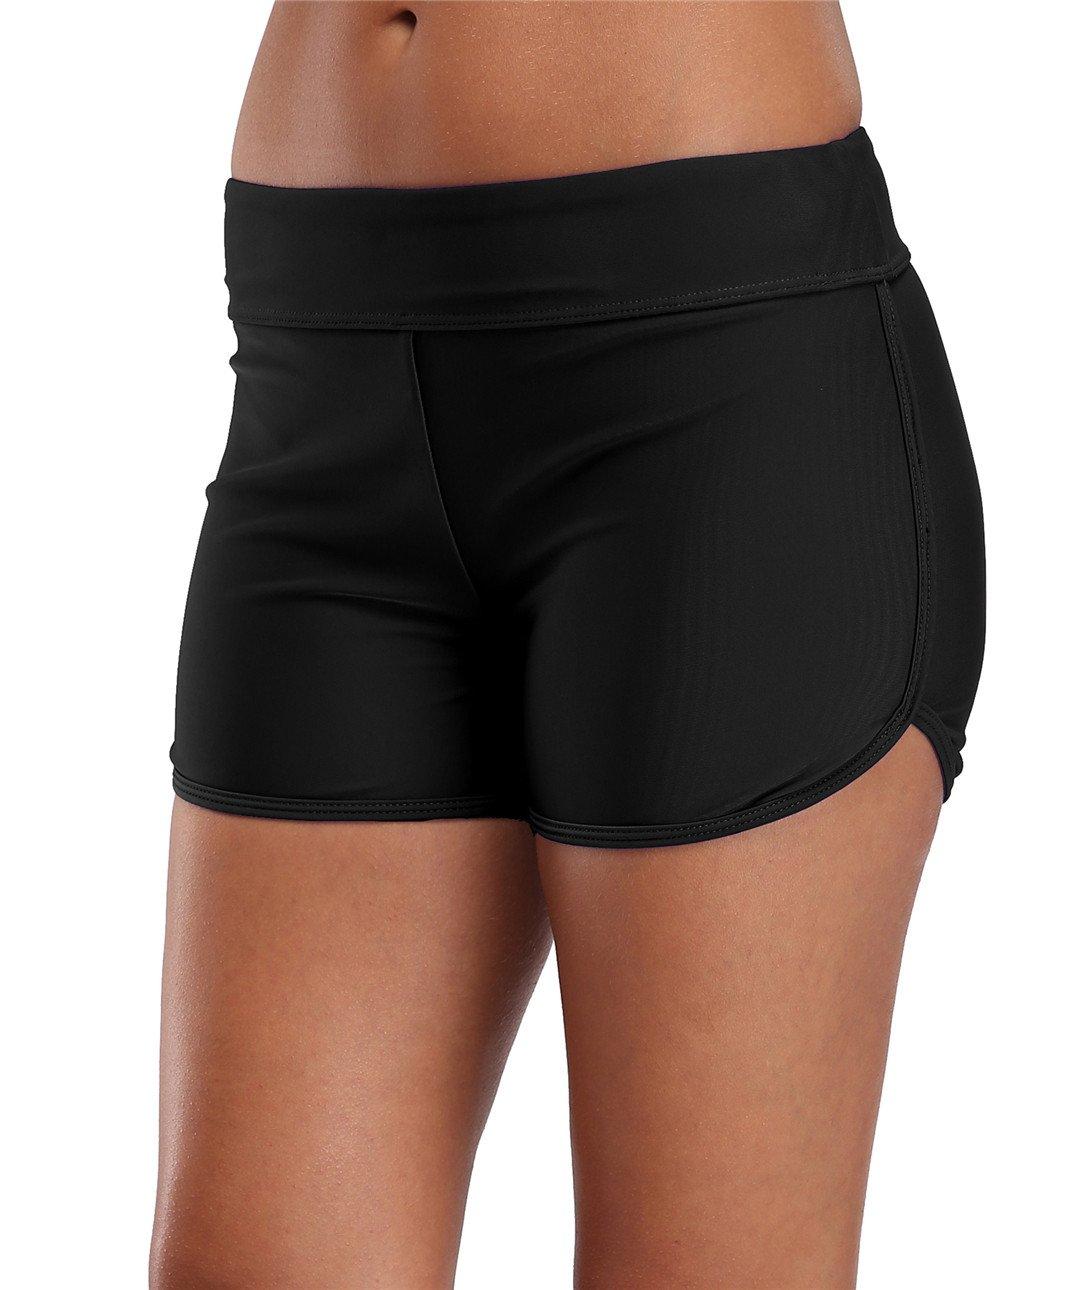 Womens Swimming Bottoms Black Plain Tankini Bottom Bikini Briefs Boy Style Tankini Shorts Tag L Black Size 10